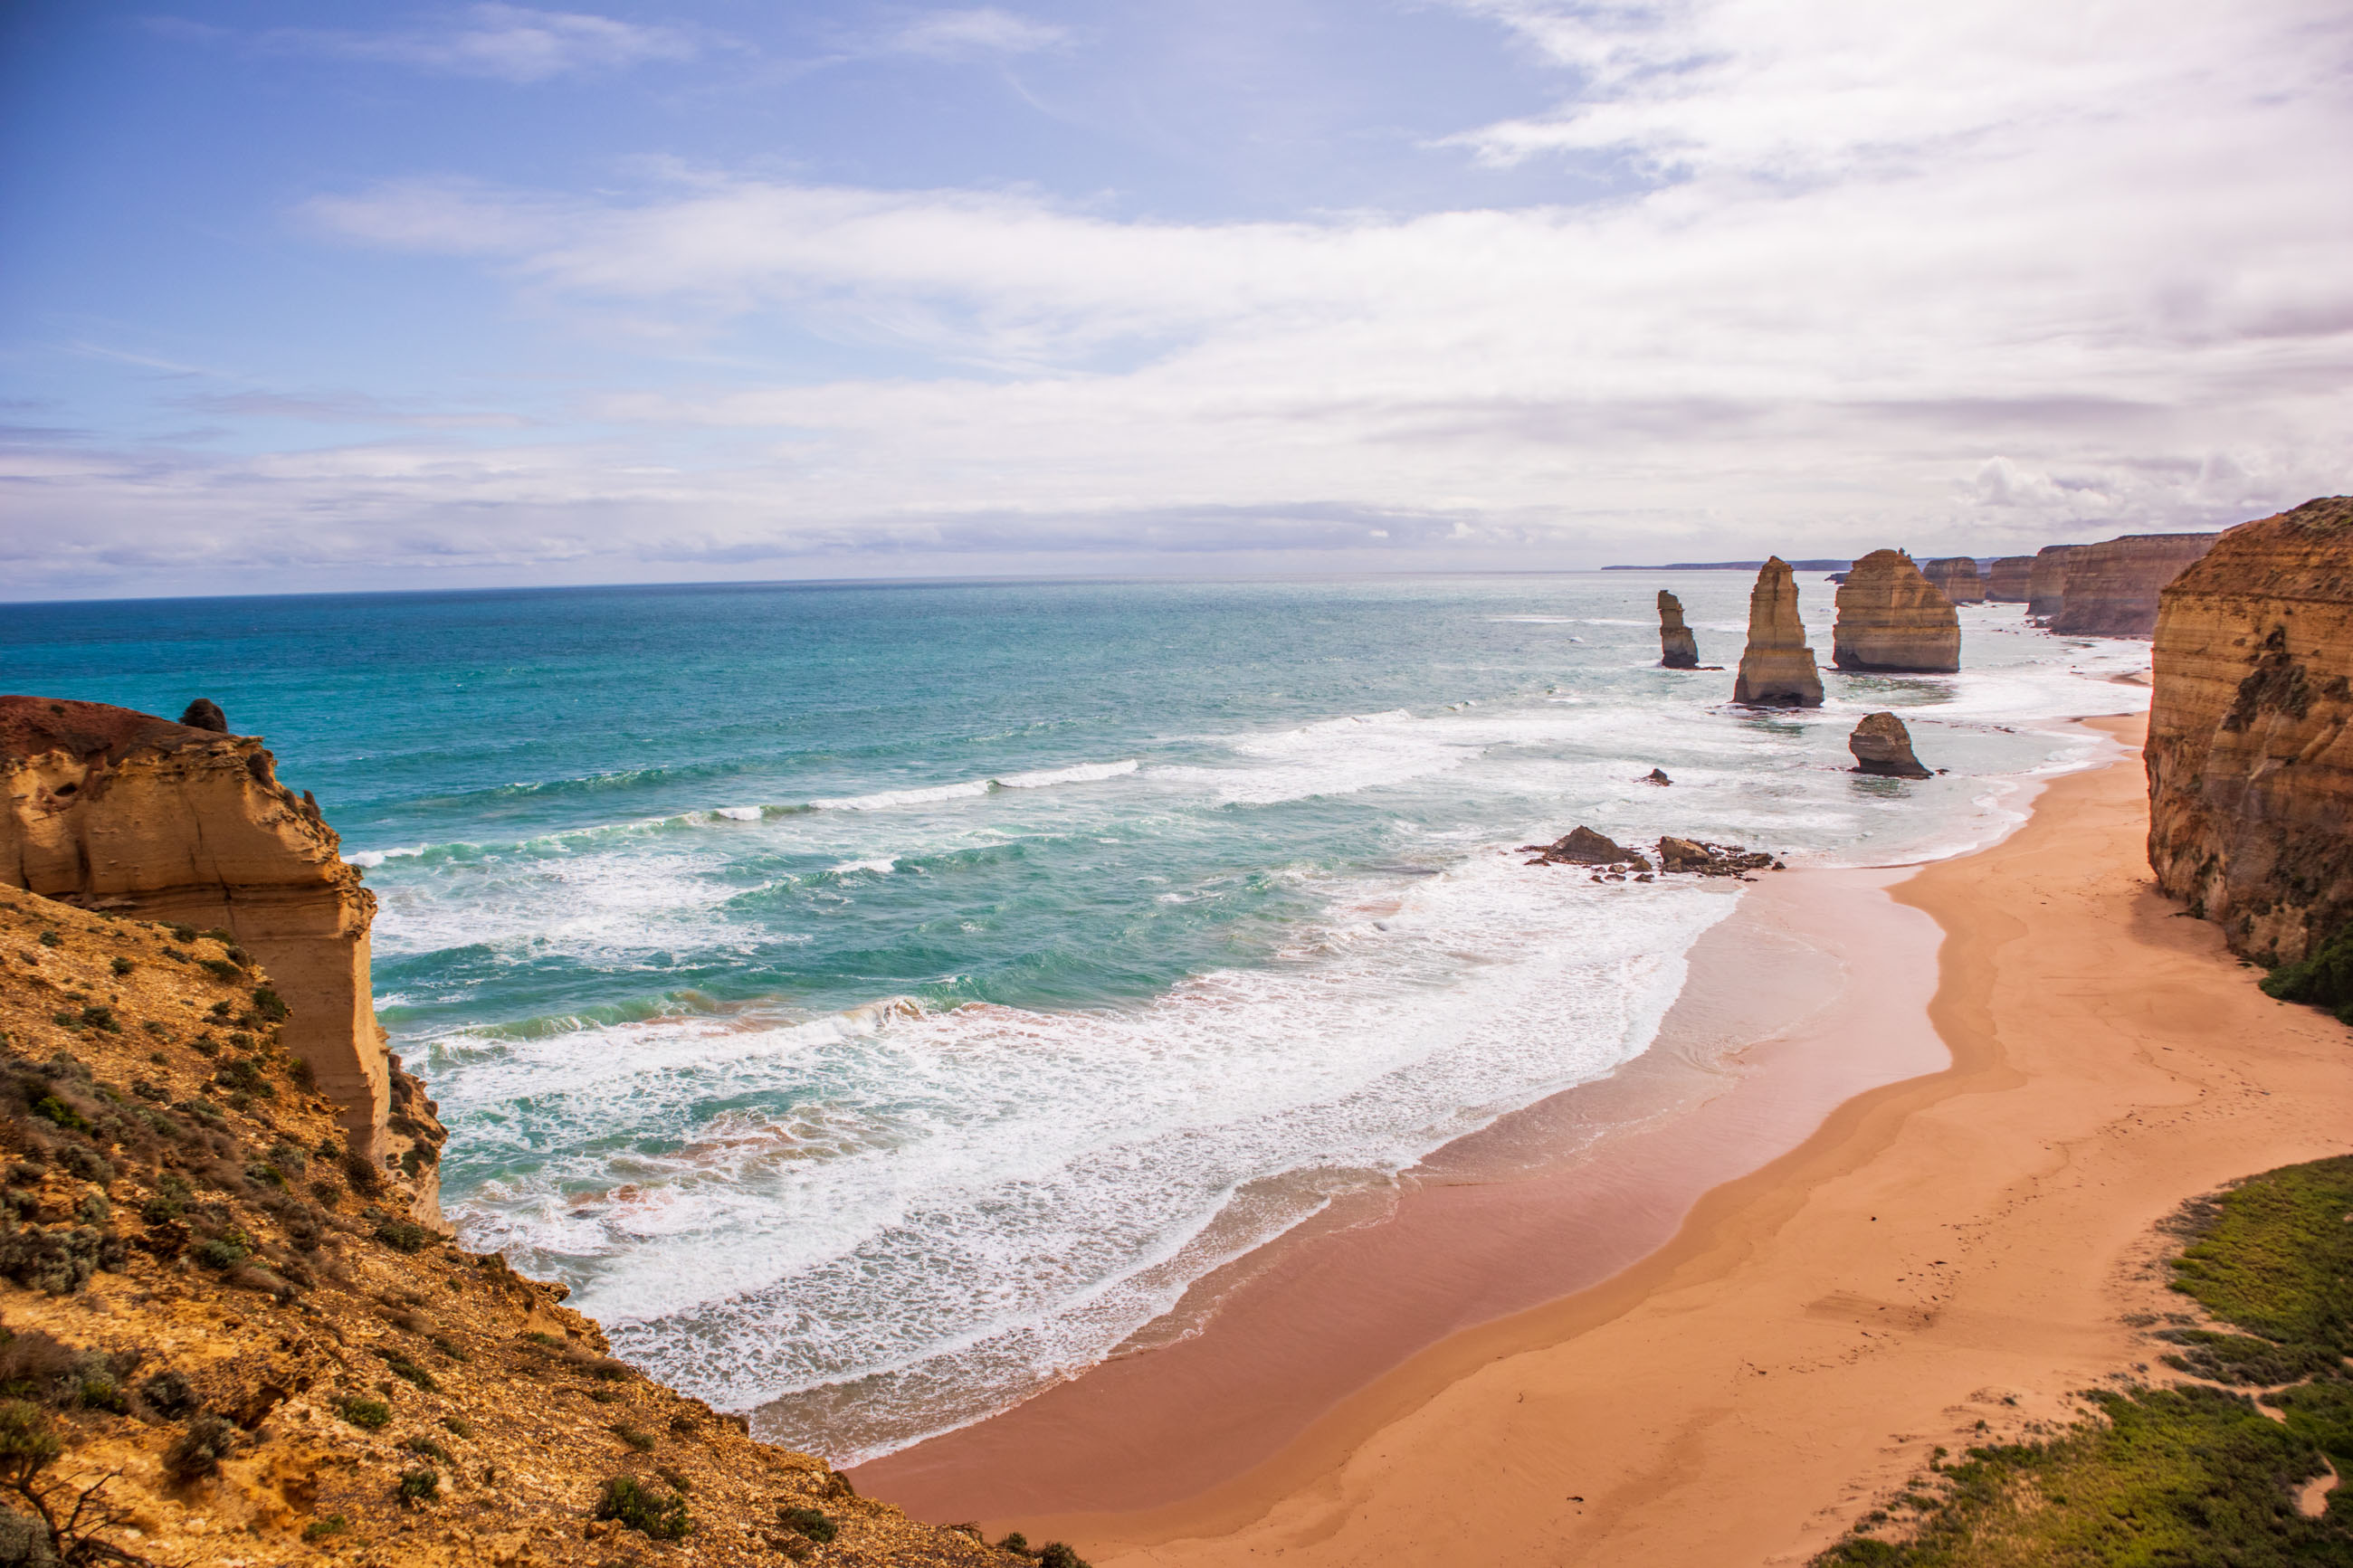 https://bubo.sk/uploads/galleries/5029/veron_hulikova_australia_greatoceanroad_12_apostolov2.jpg